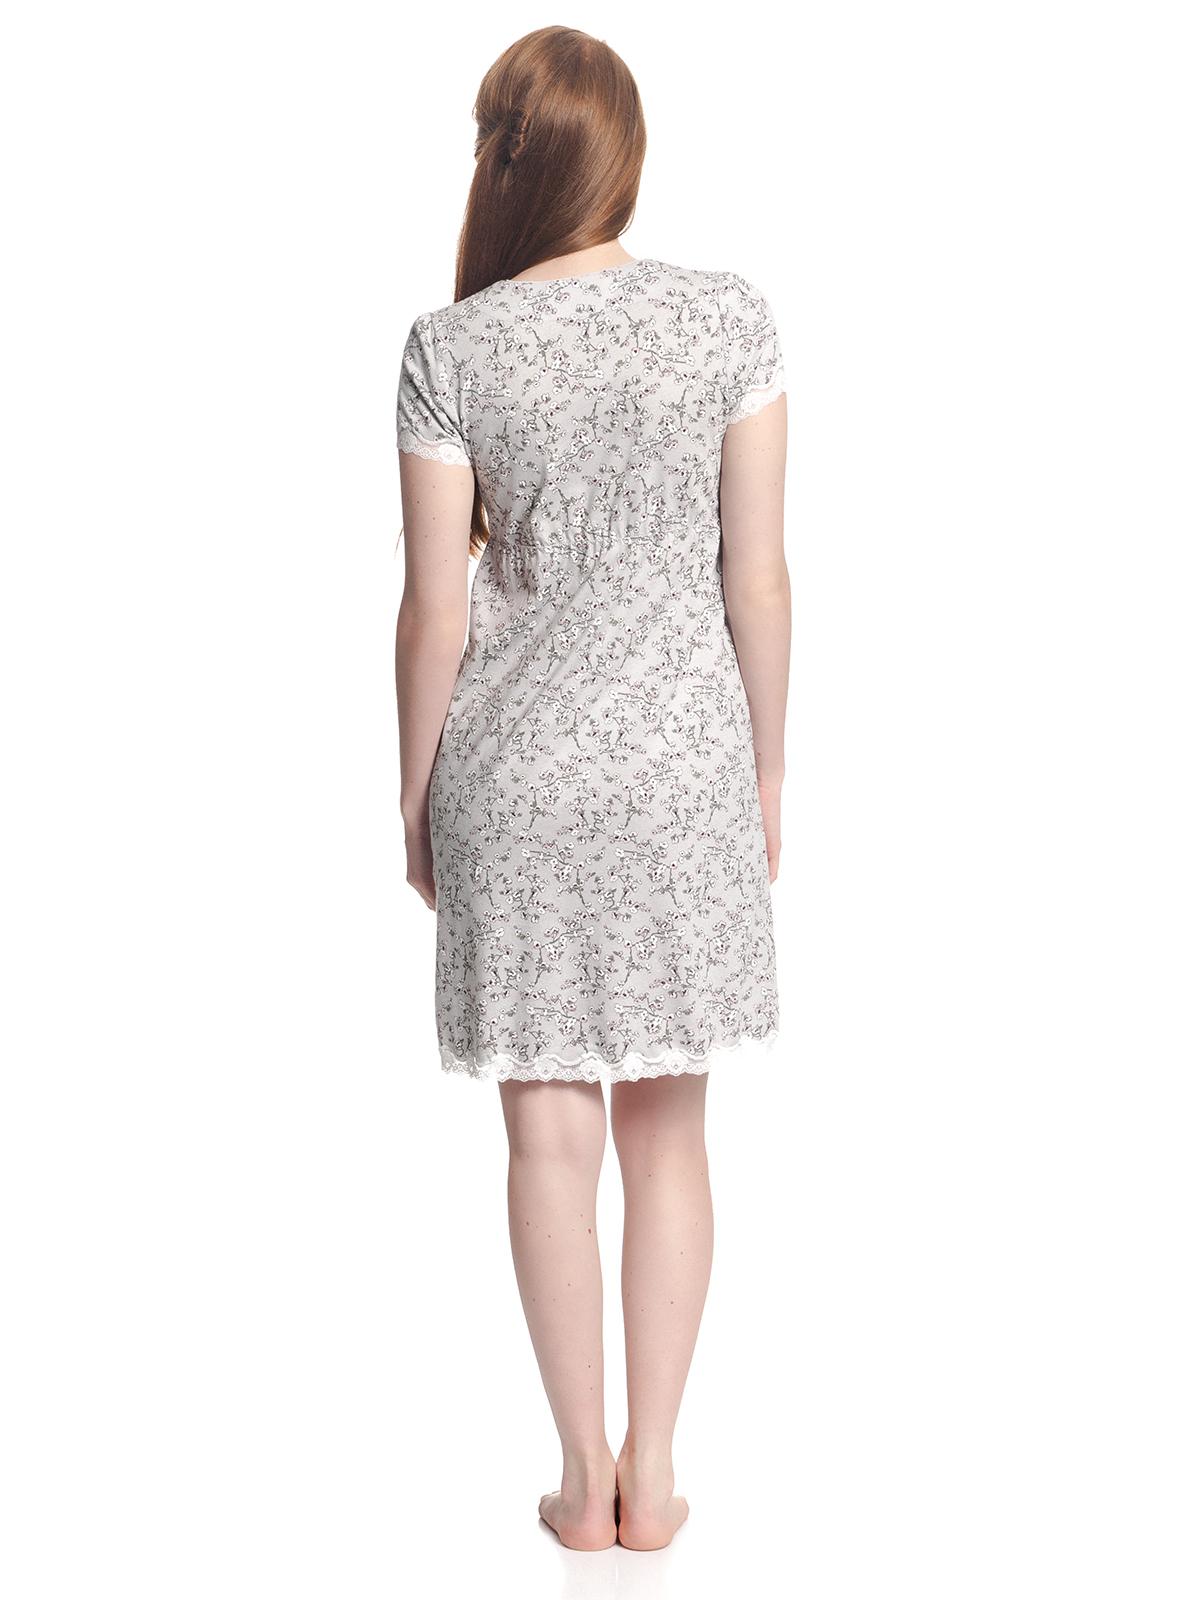 best website 86589 aeecb Vive Maria Cherry Blossom Damen Nachthemd Grau Allover